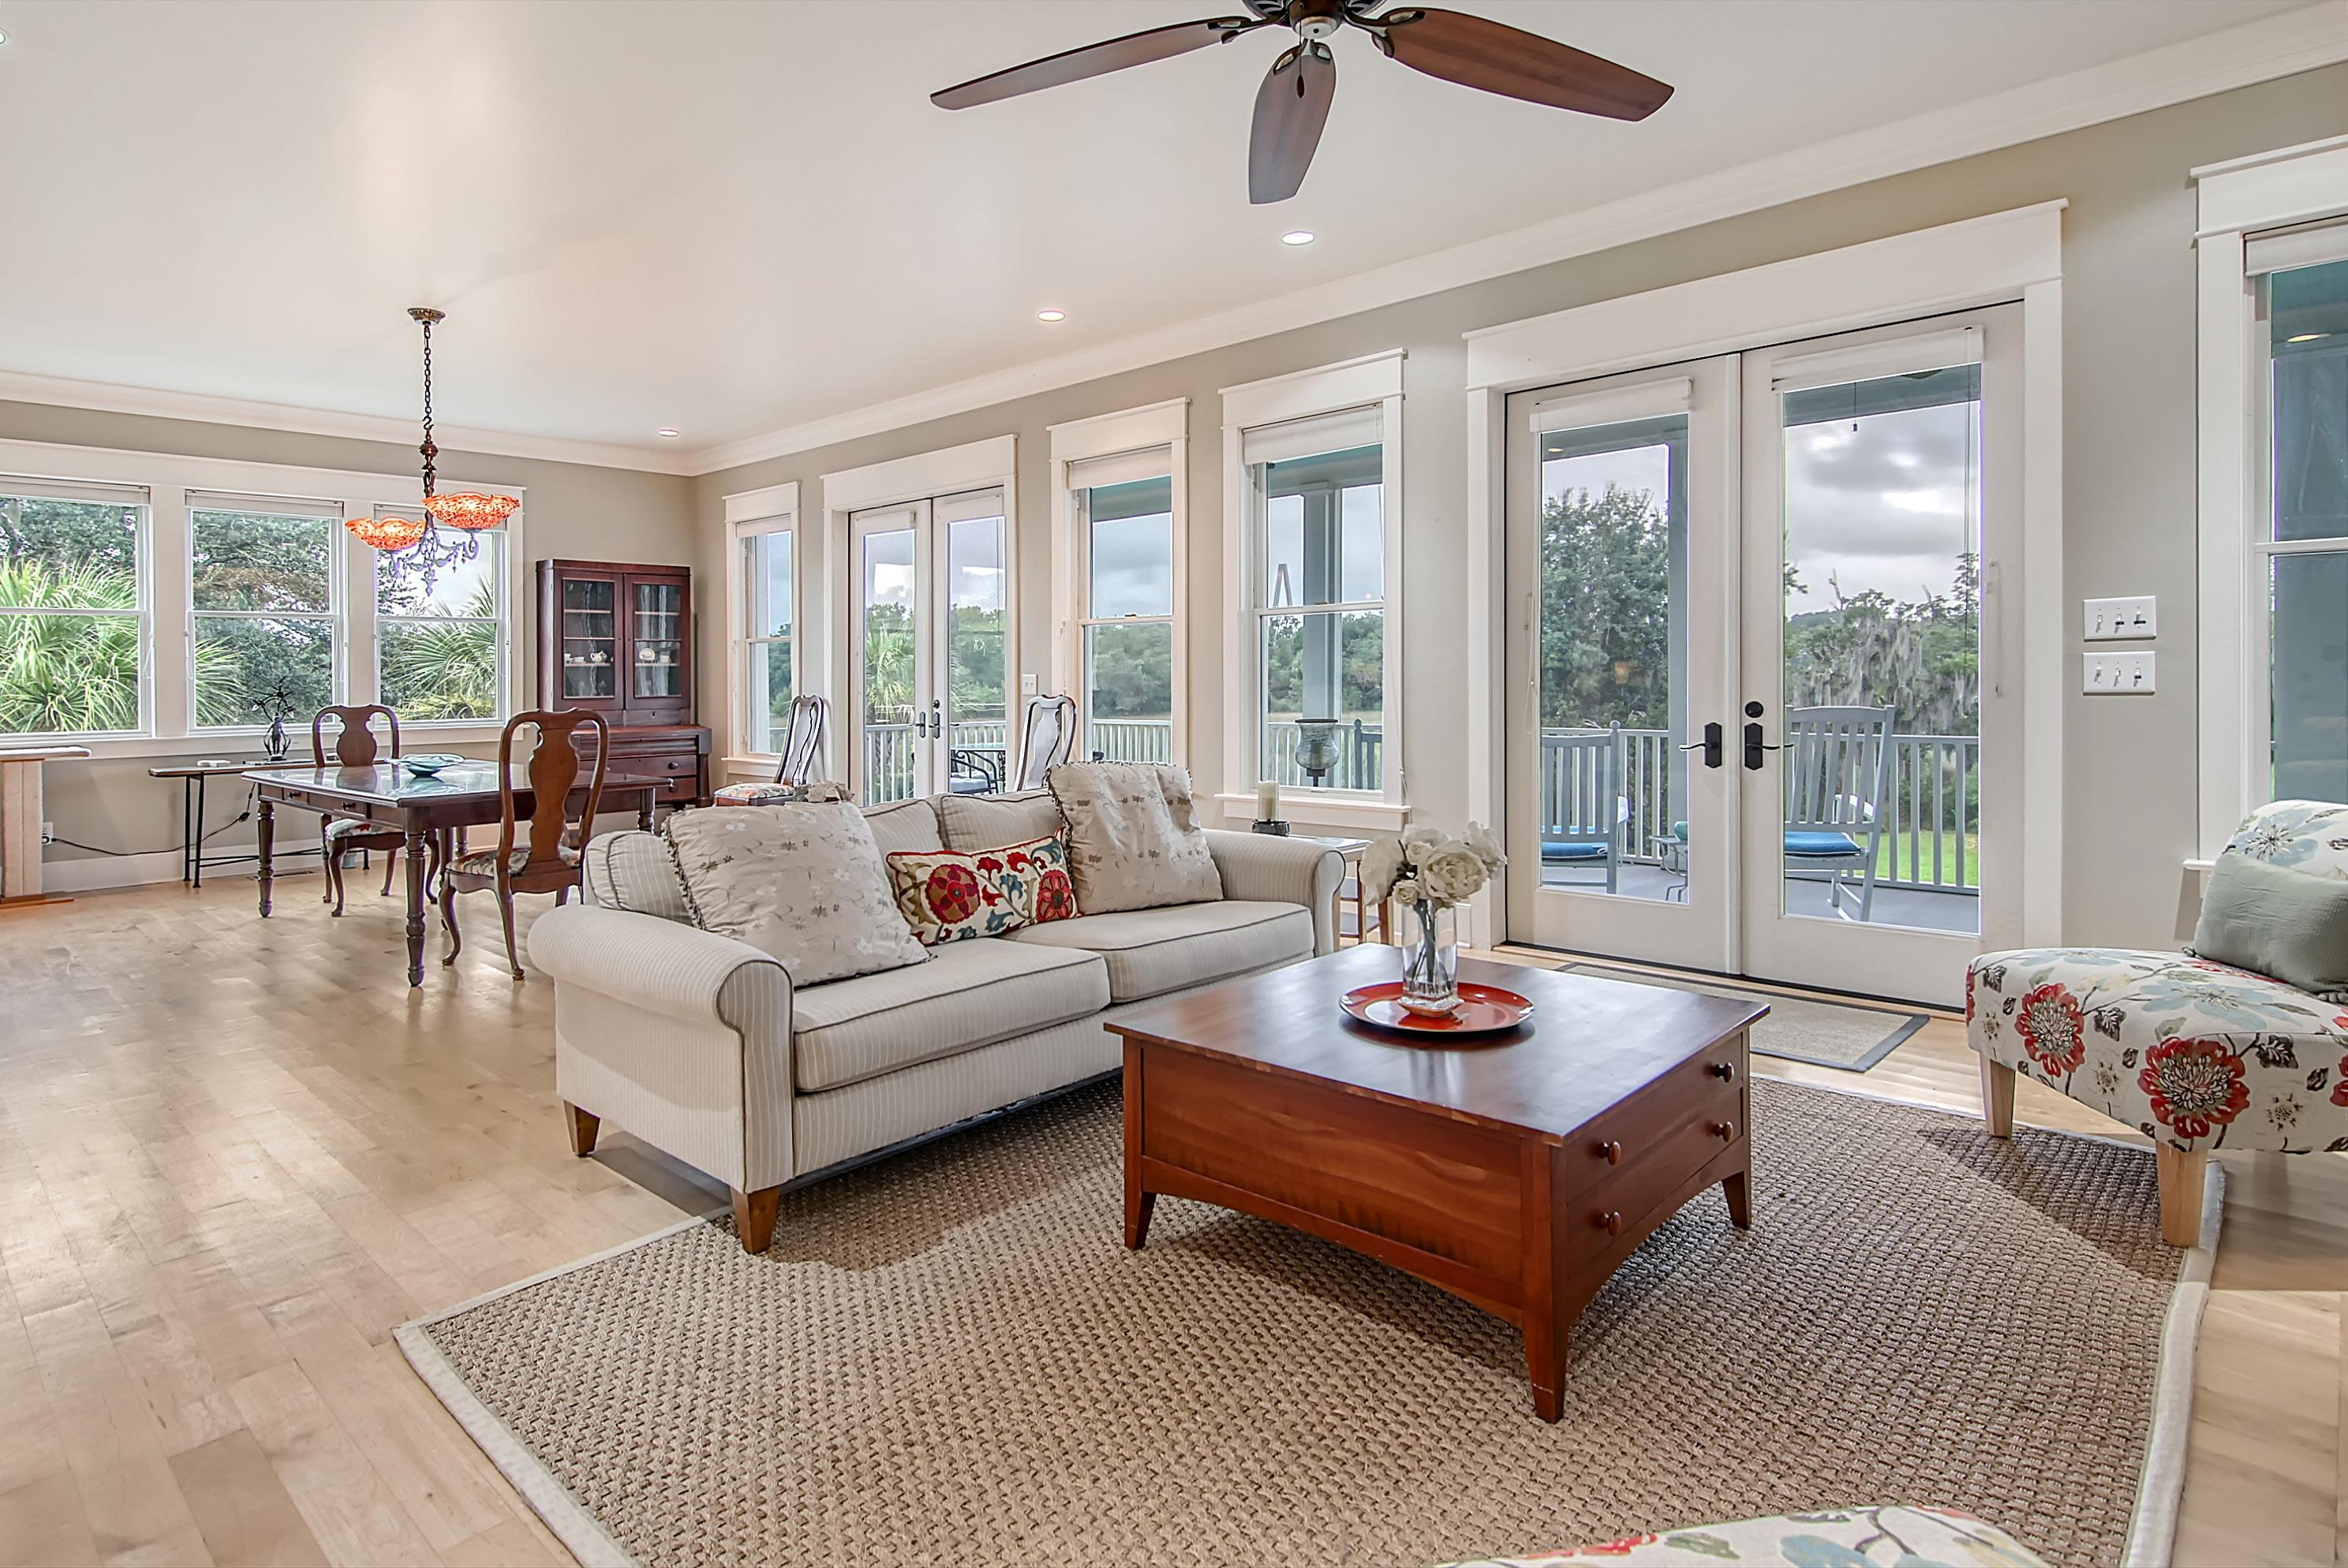 Scanlonville Homes For Sale - 152 6th, Mount Pleasant, SC - 11